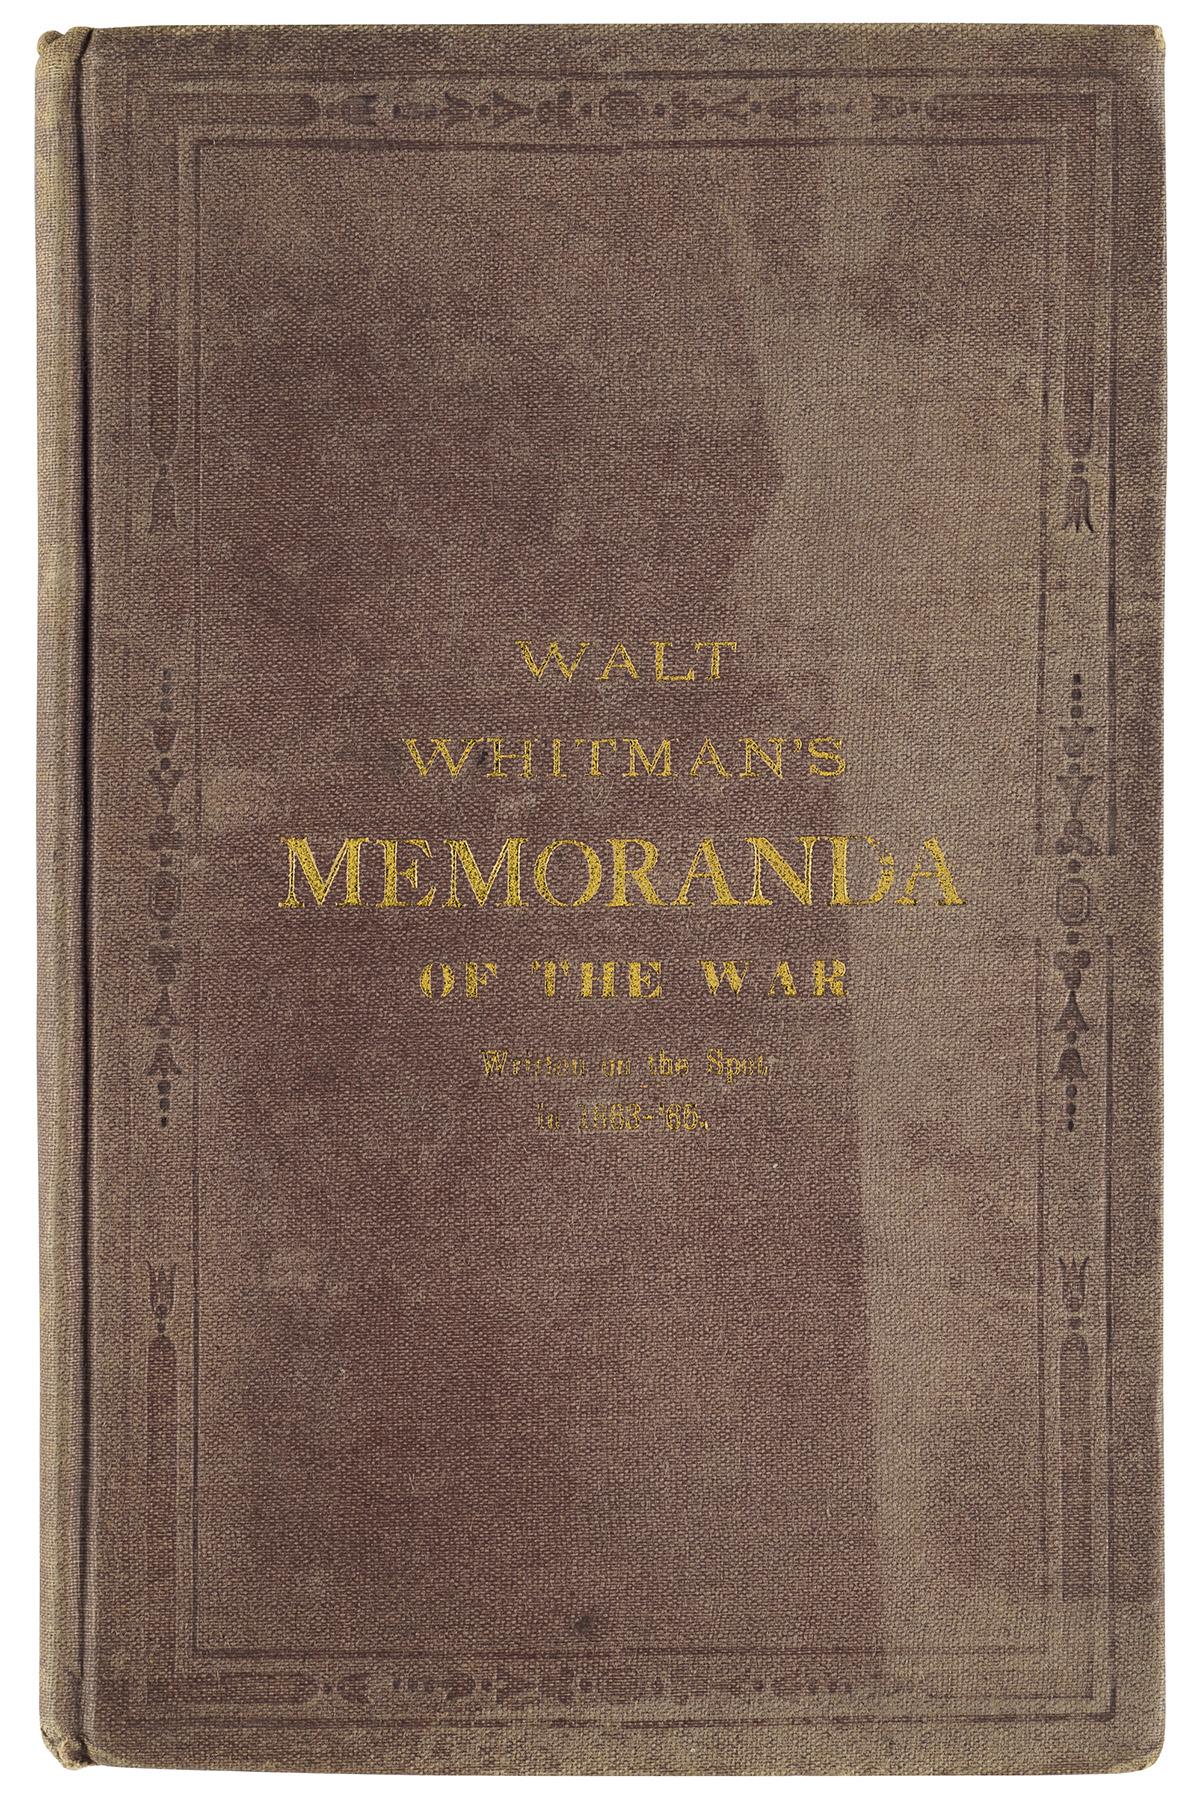 WALT WHITMAN (1819-1892)  Memoranda Of the War.